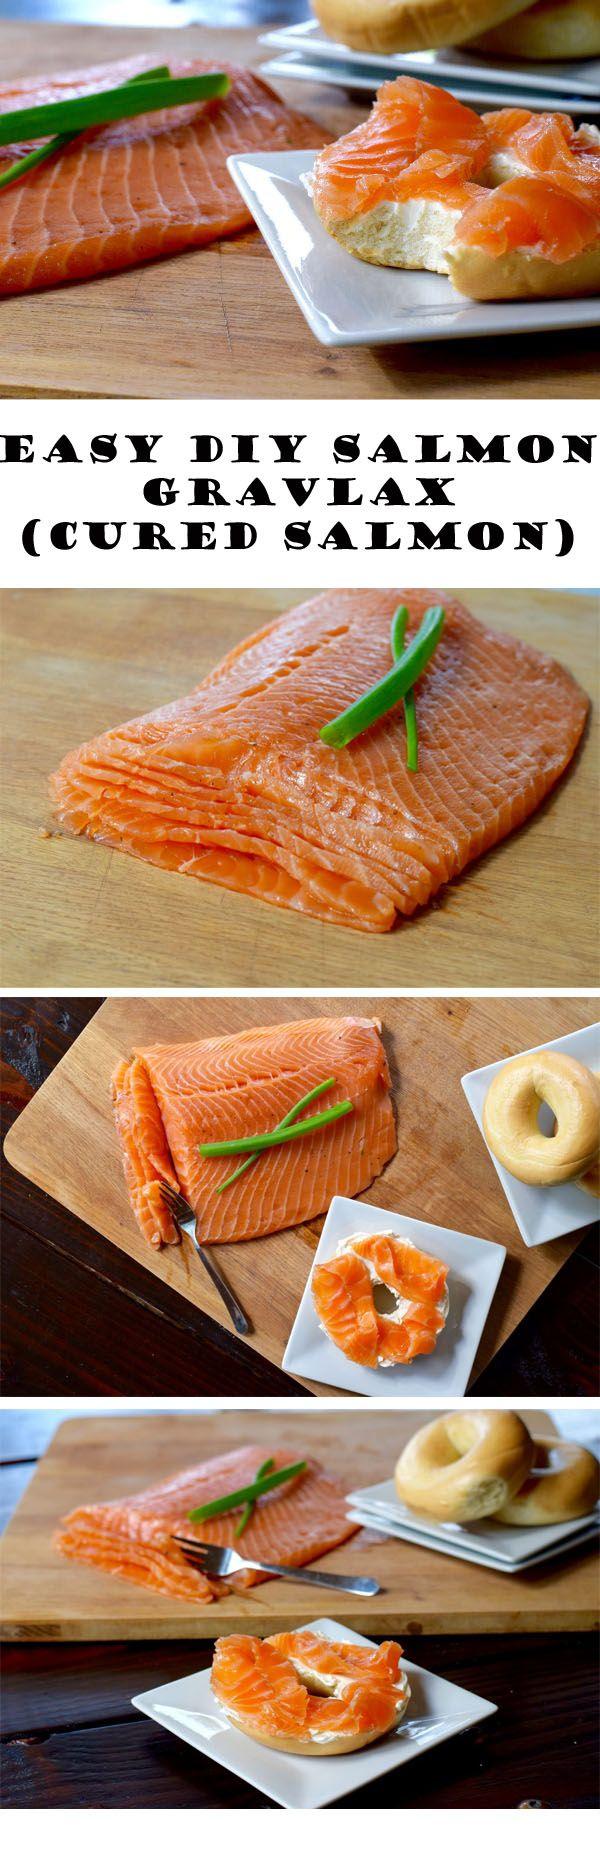 Easy DIY Salmon Gravlax